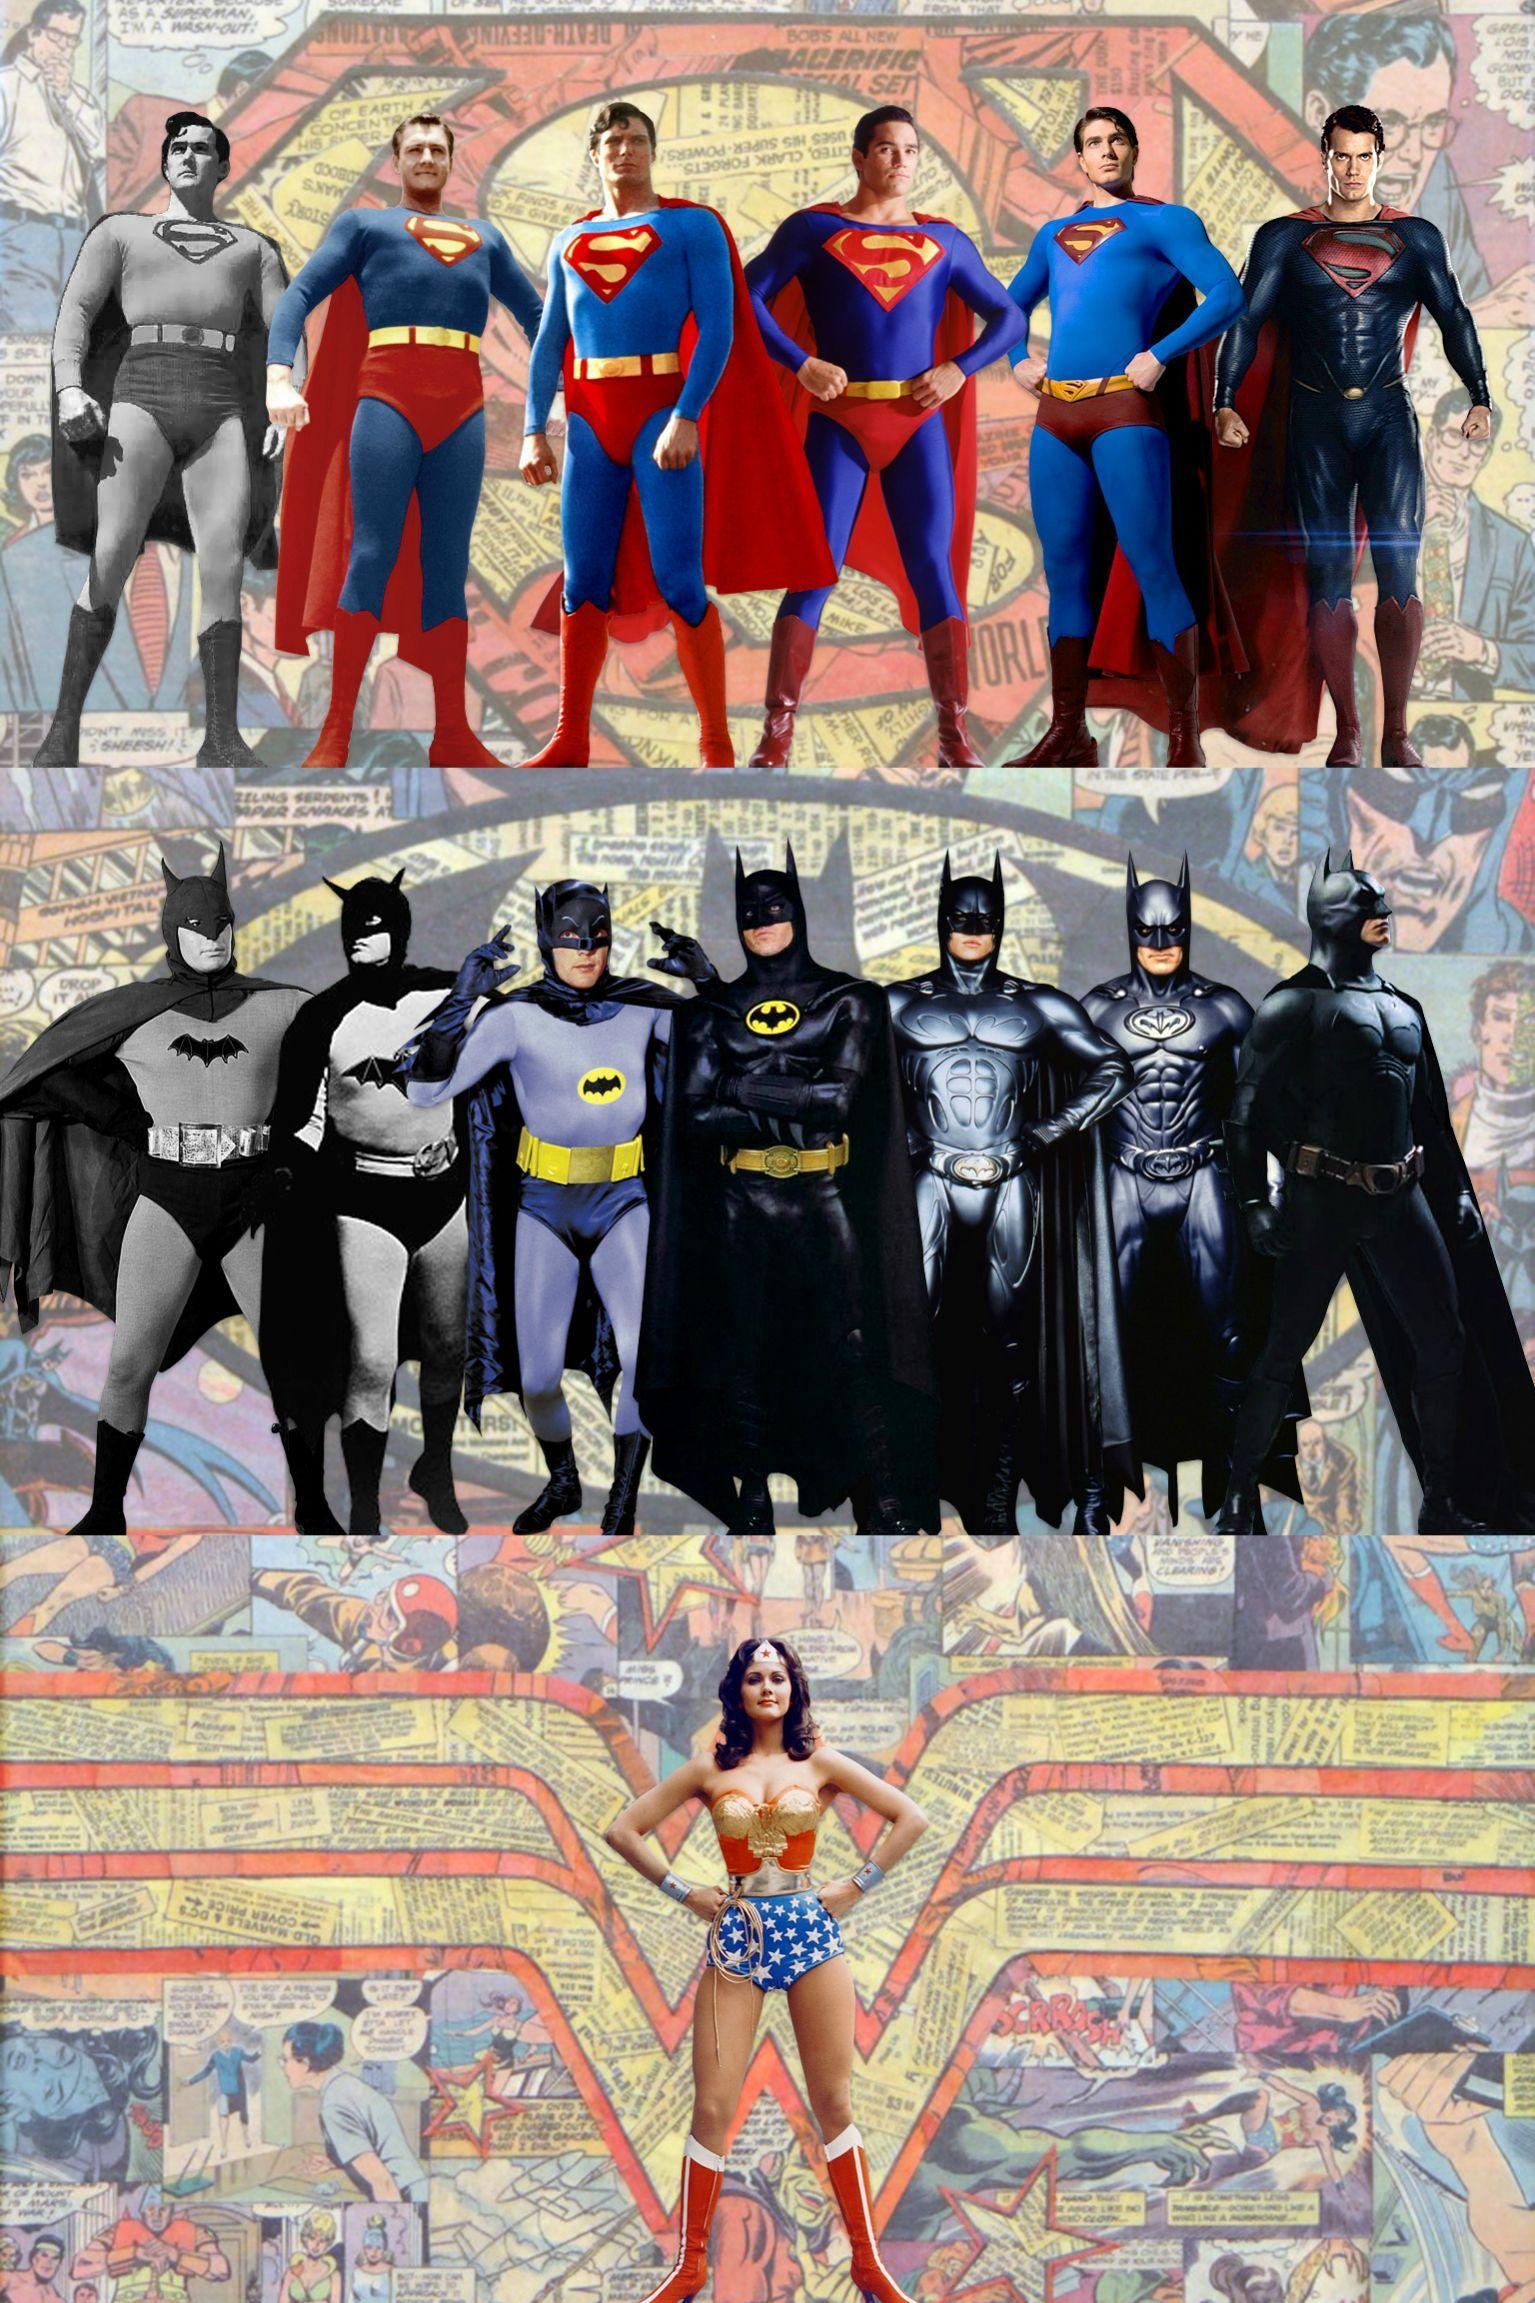 A History Of Dc S Most Famous Live Action Costumes Batman And Superman Superhero Wonder Woman